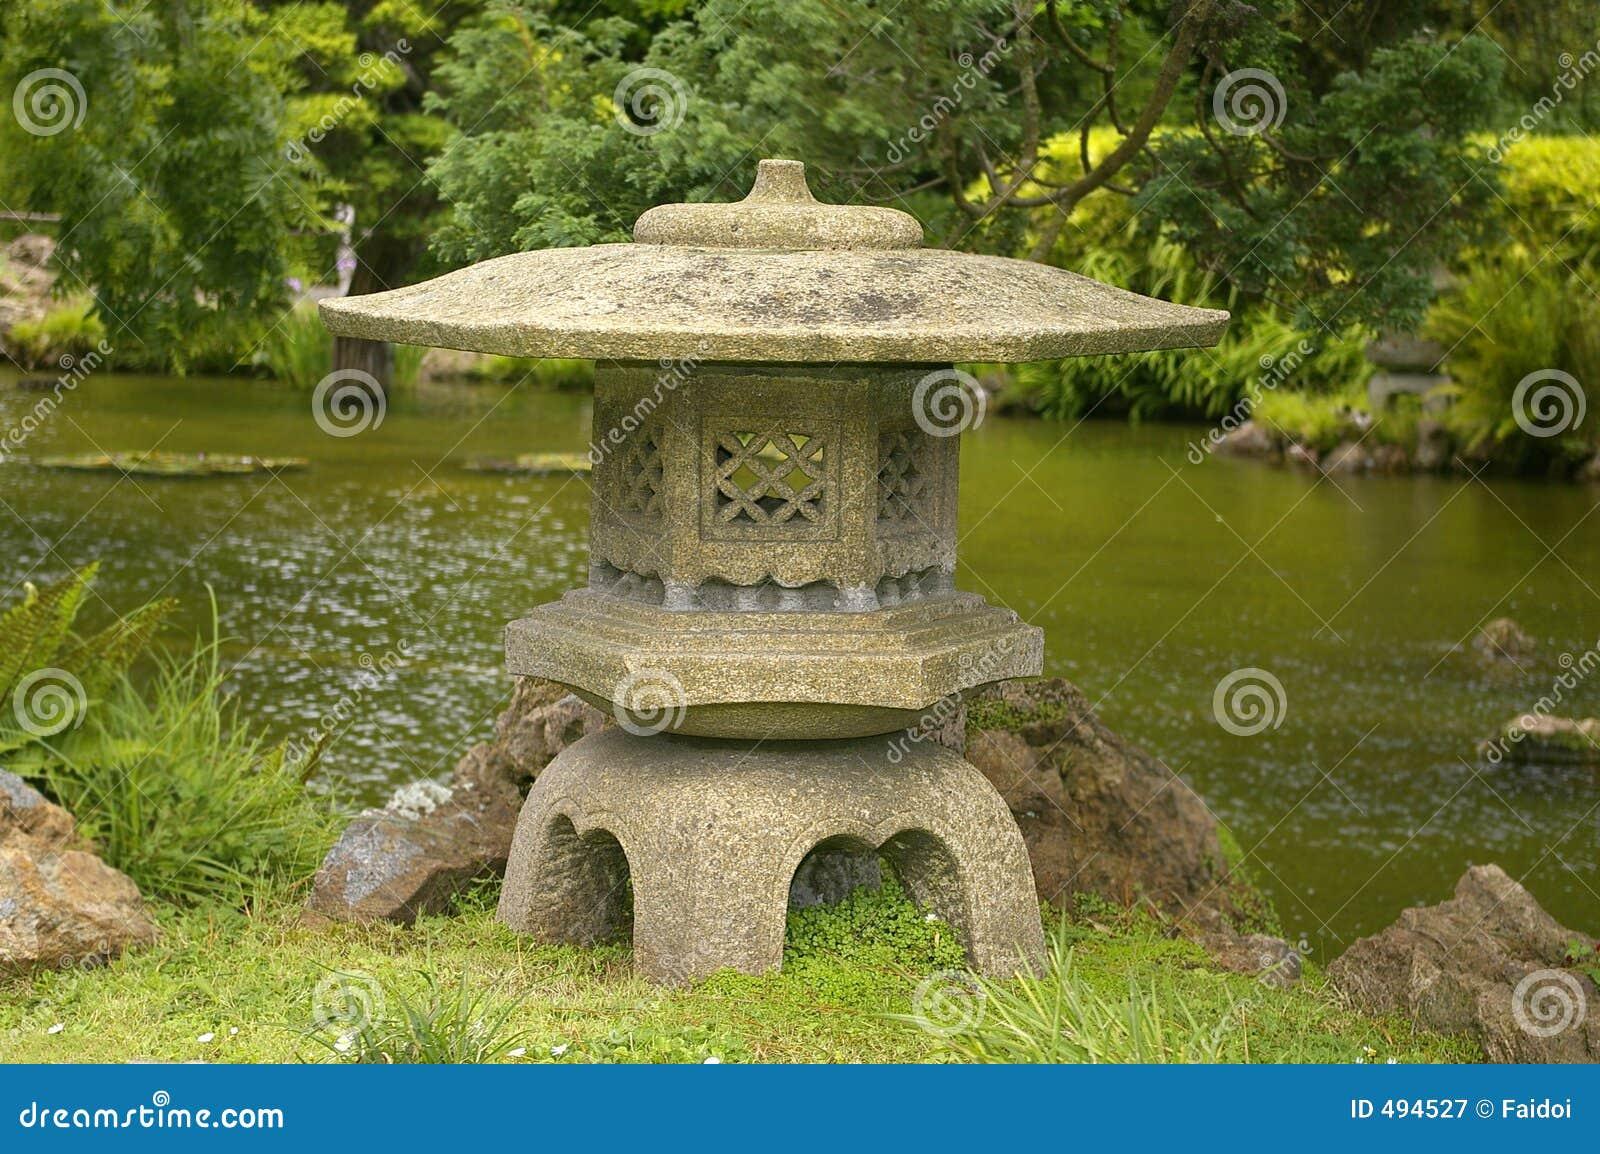 japanese stone lantern stock image image of culture. Black Bedroom Furniture Sets. Home Design Ideas